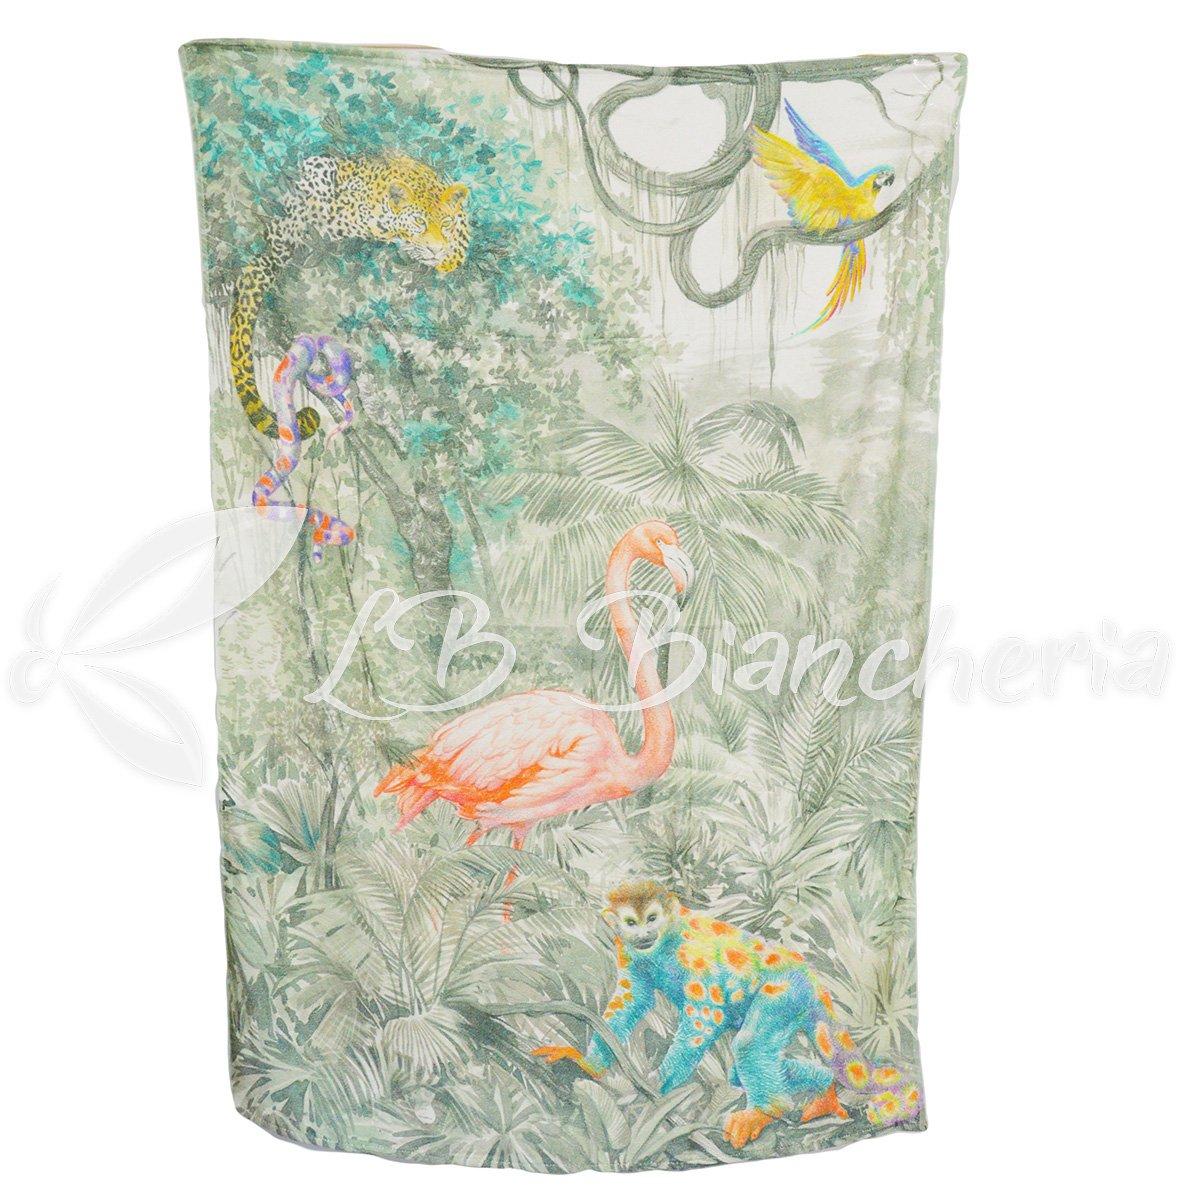 RP toalla playa Esponja tamaño maxi tropical-stampa digitale-made in Italy - cm 100 x 150 - Flamenco: Amazon.es: Hogar